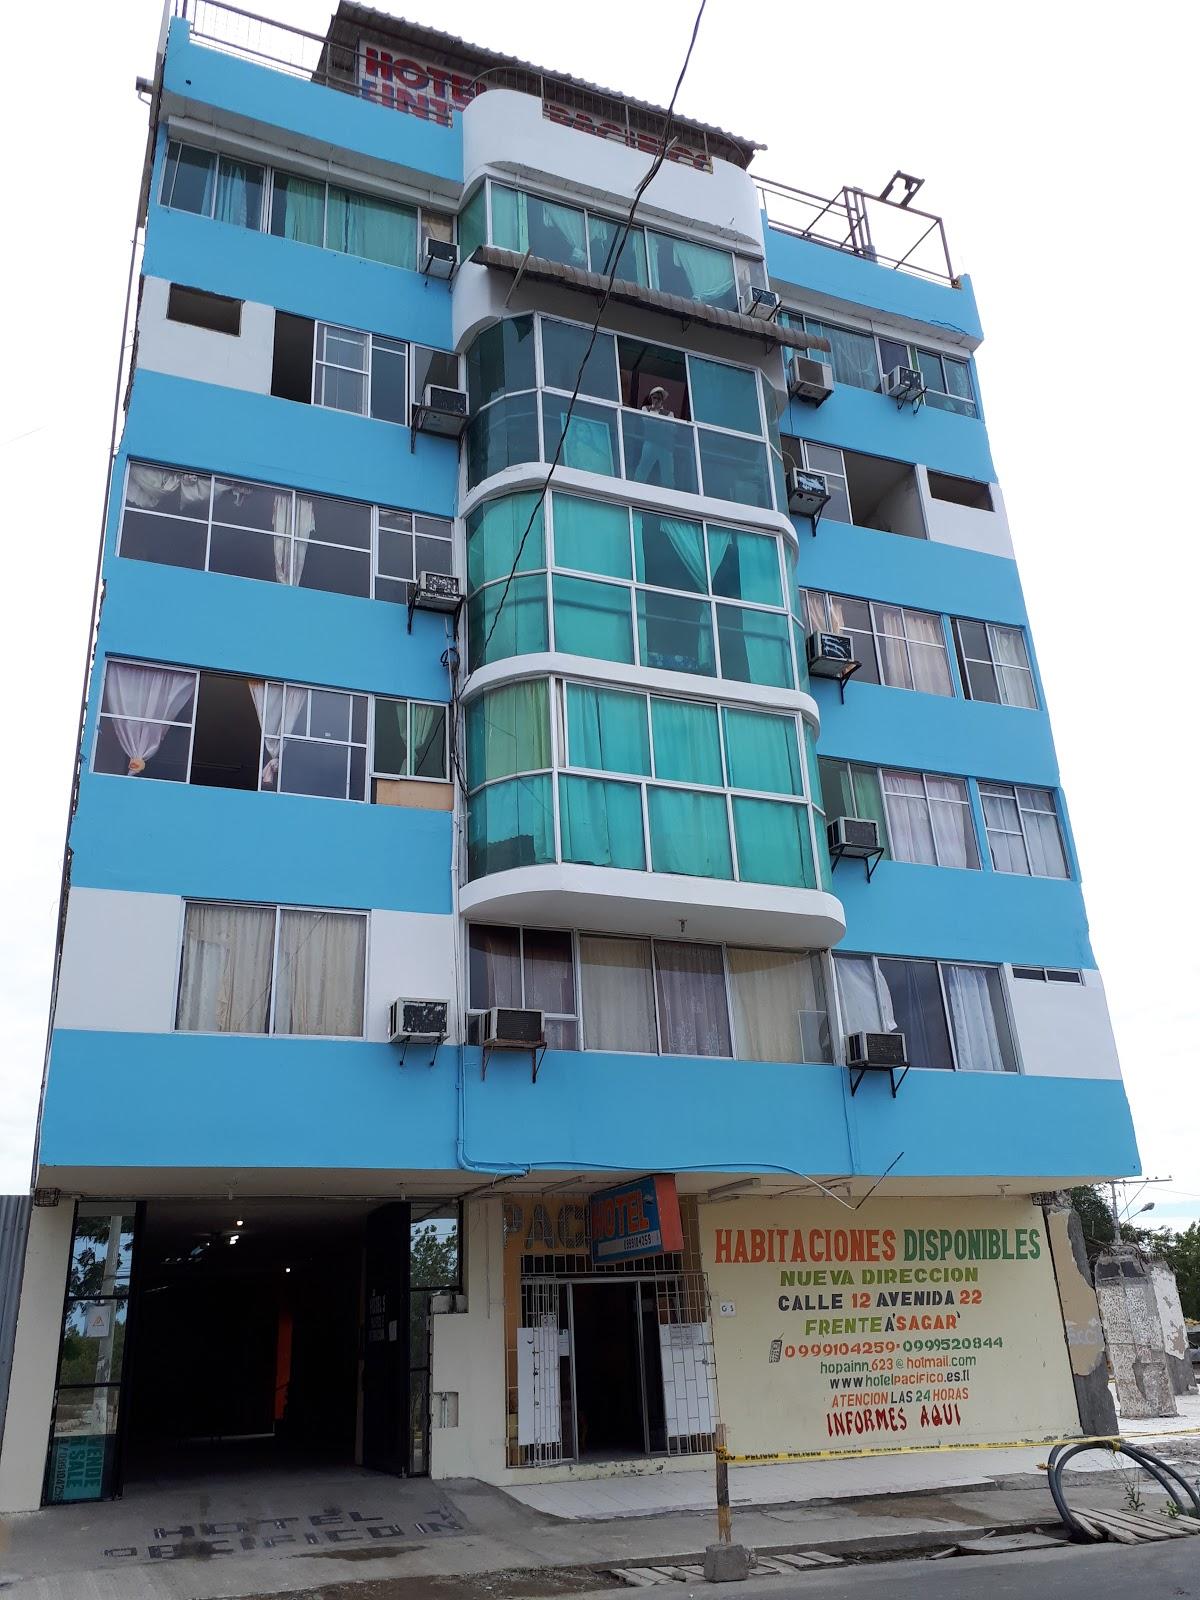 PROMO] Hotel Perla Spondylus Avenida 3 Cheap Hotels Manta